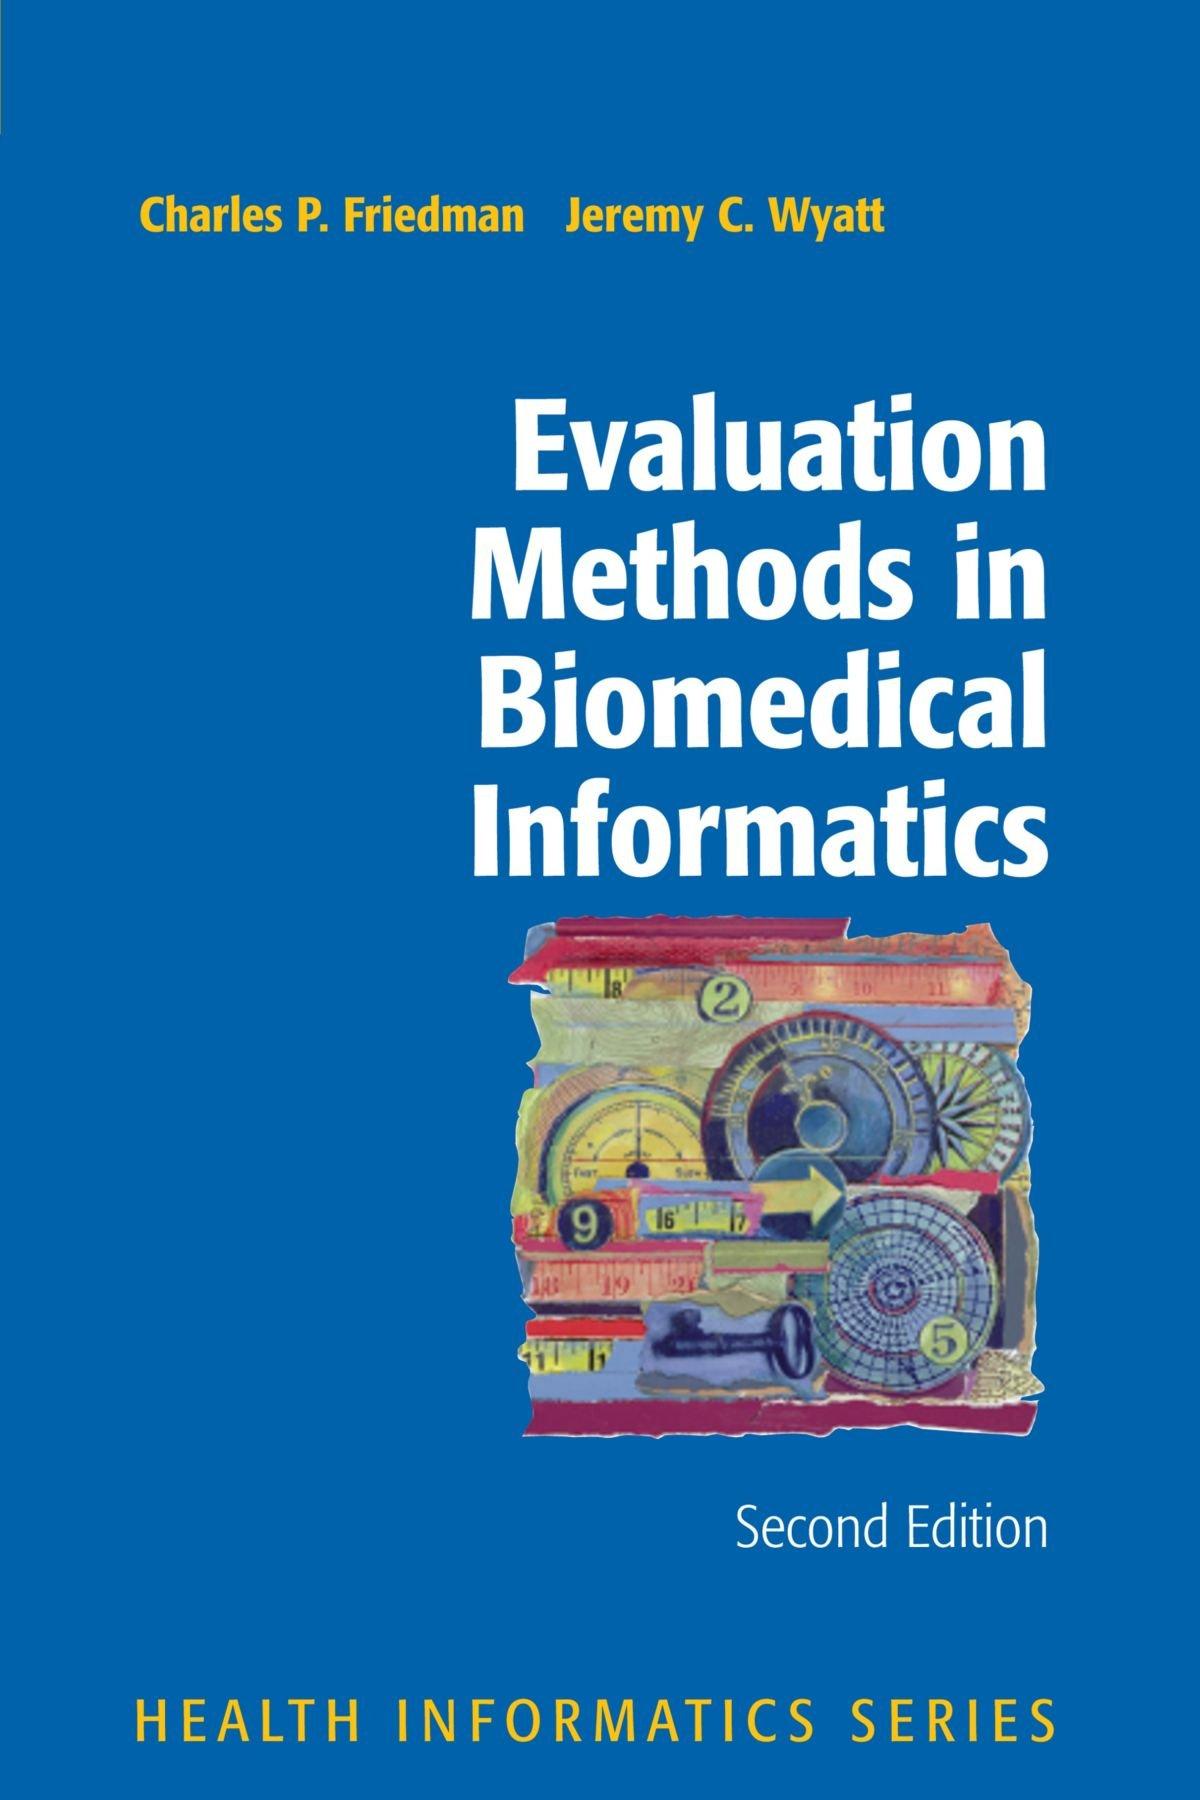 Evaluation Methods in Biomedical Informatics (Health Informatics) by Charles P Friedman